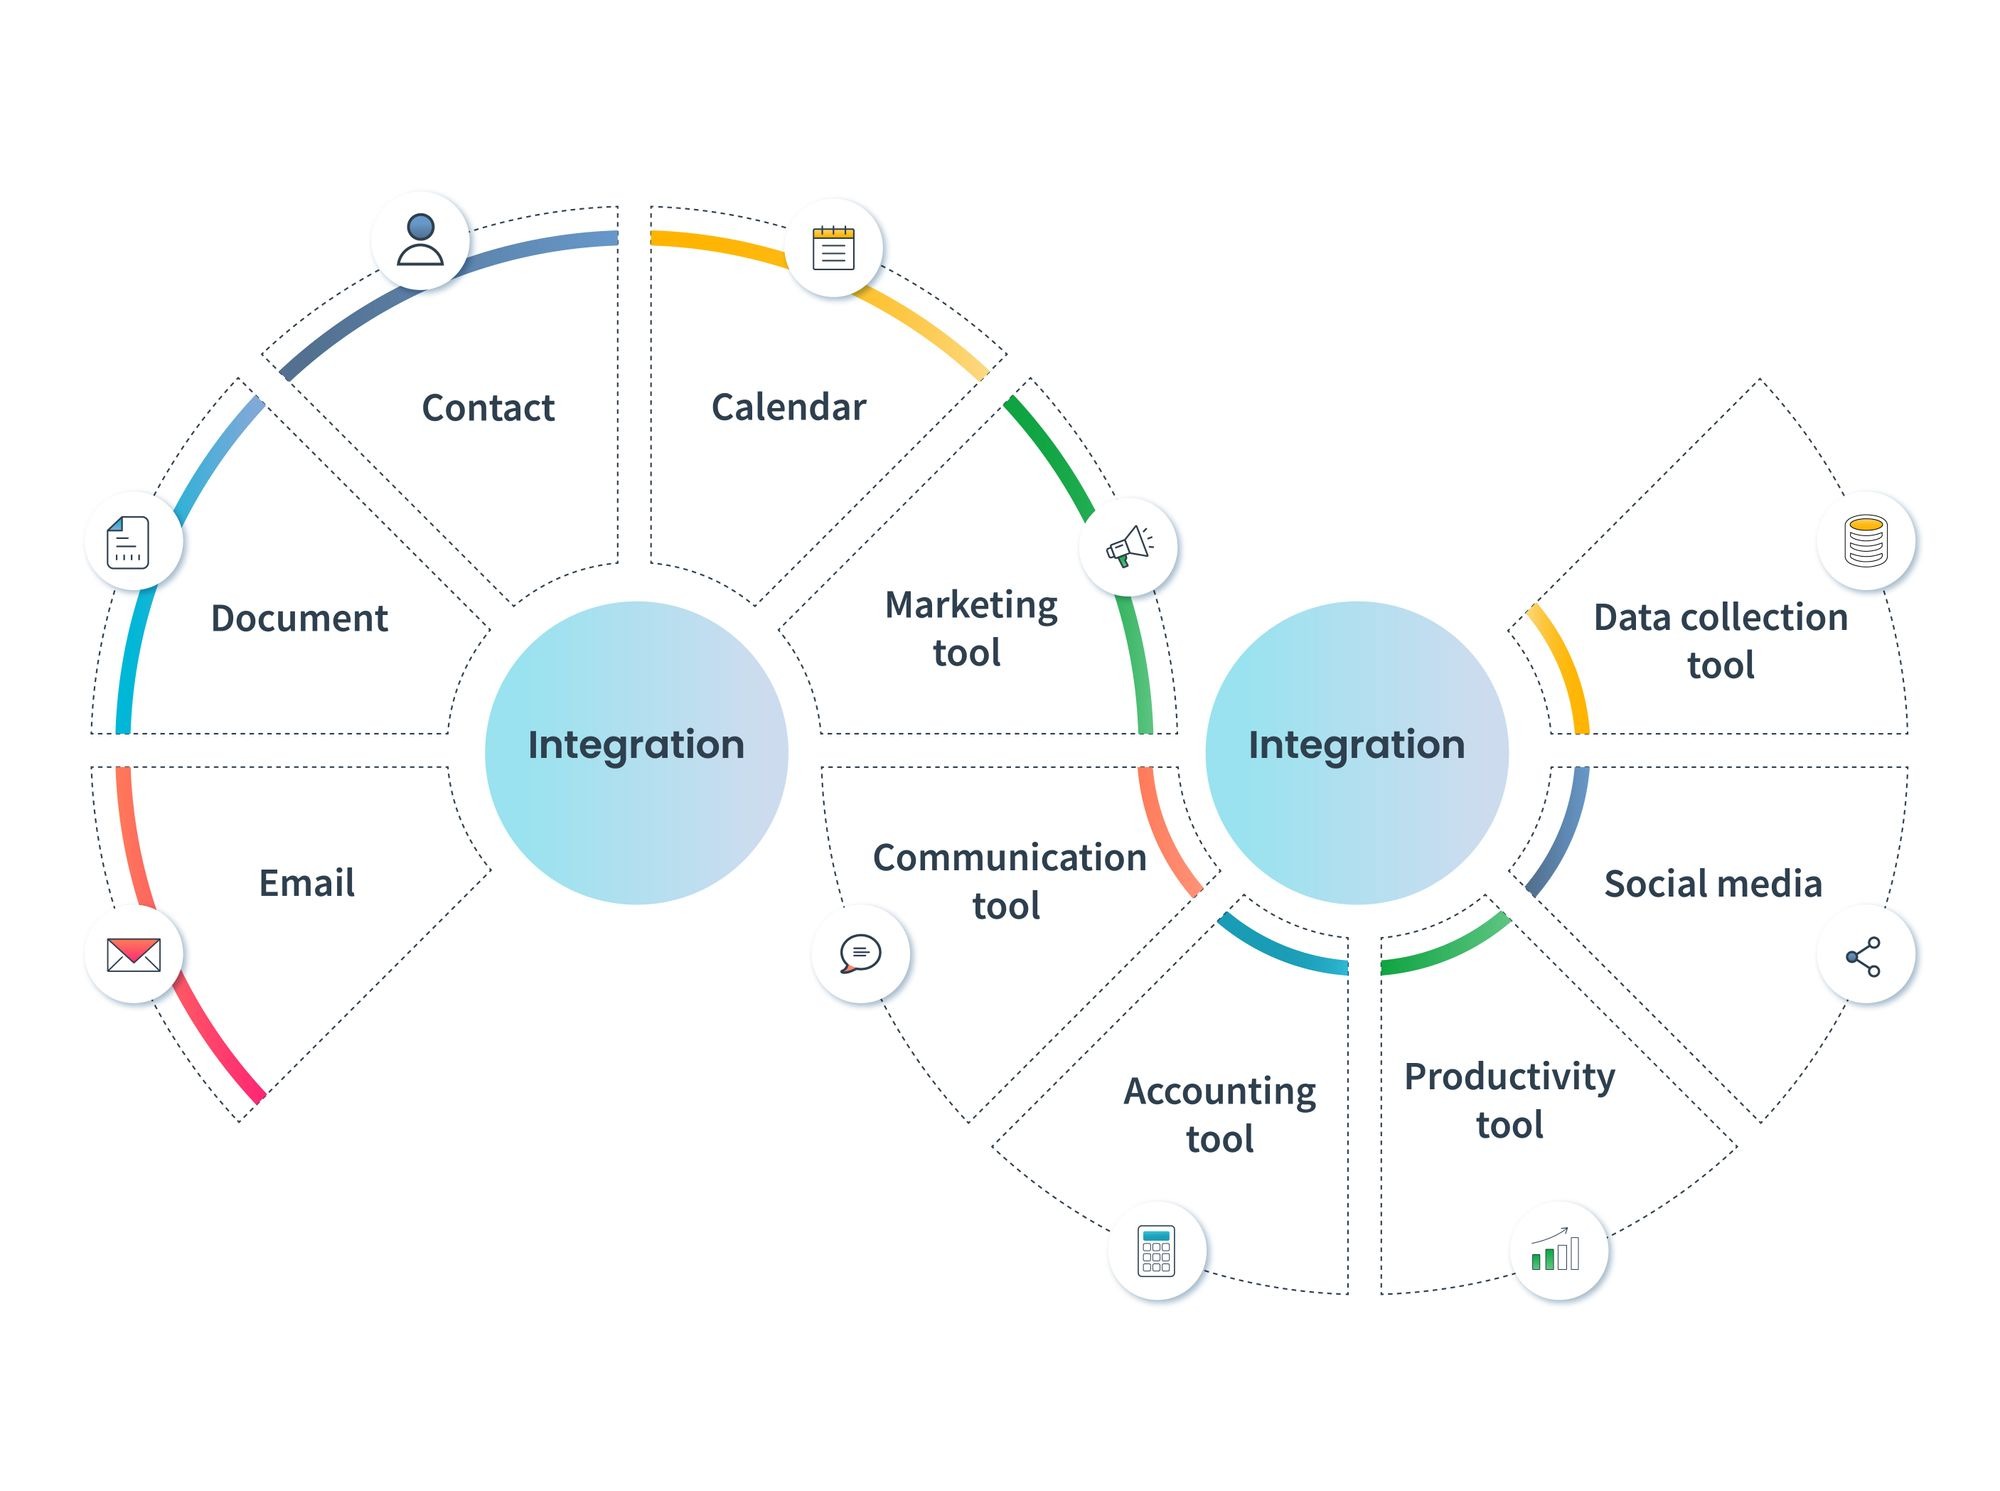 CRM system integrations: Gmail CRM integration, Outlook CRM integration, Mailchimp CRM integration